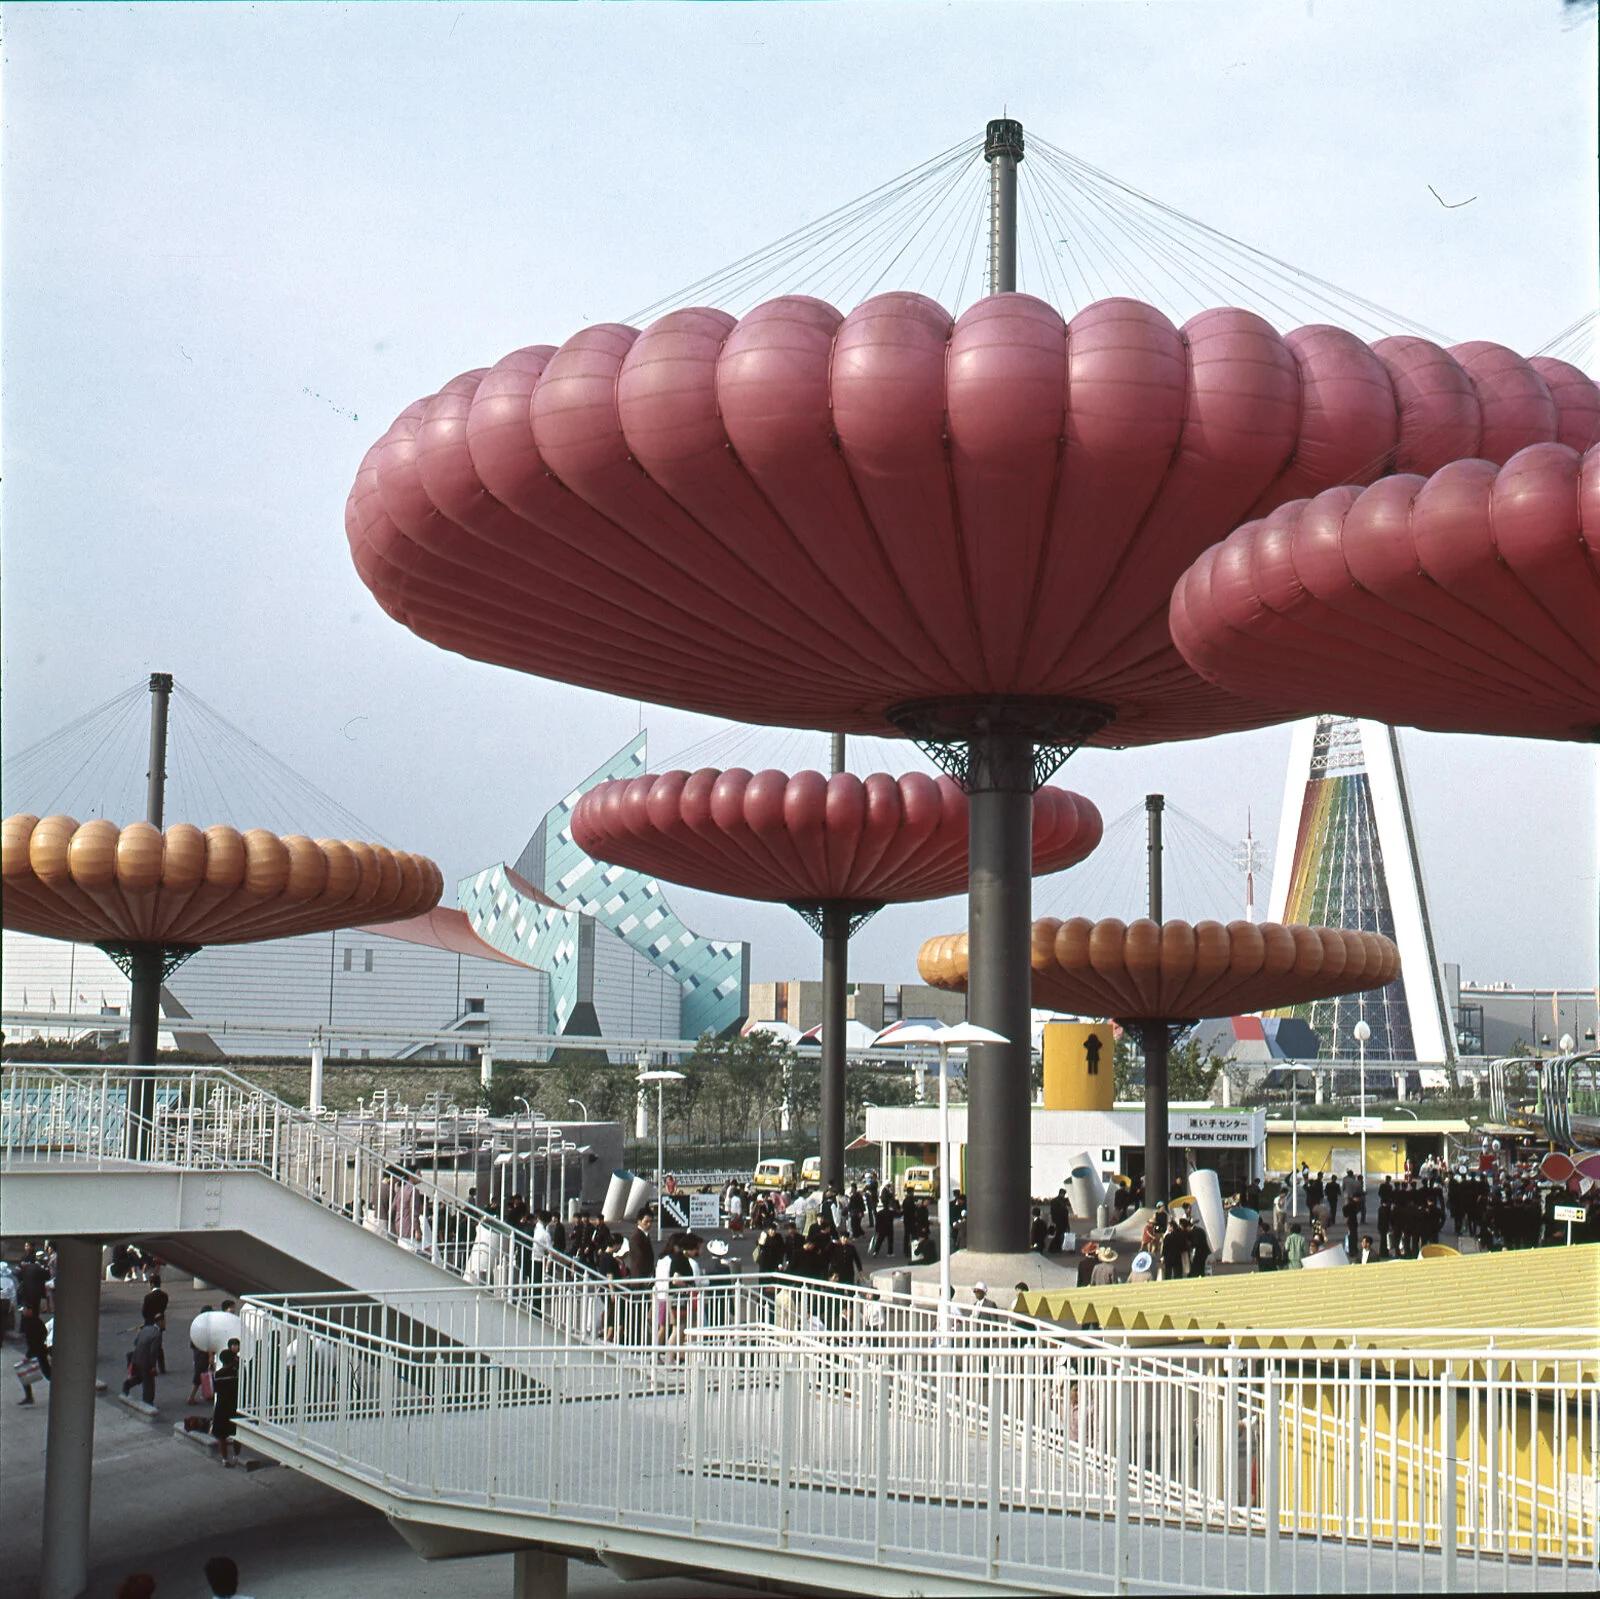 Taneo Oki and Sekkeirengo's Mushballoon at the Osaka World Expo, 1970. Photography: Centre Pompidou-Metz